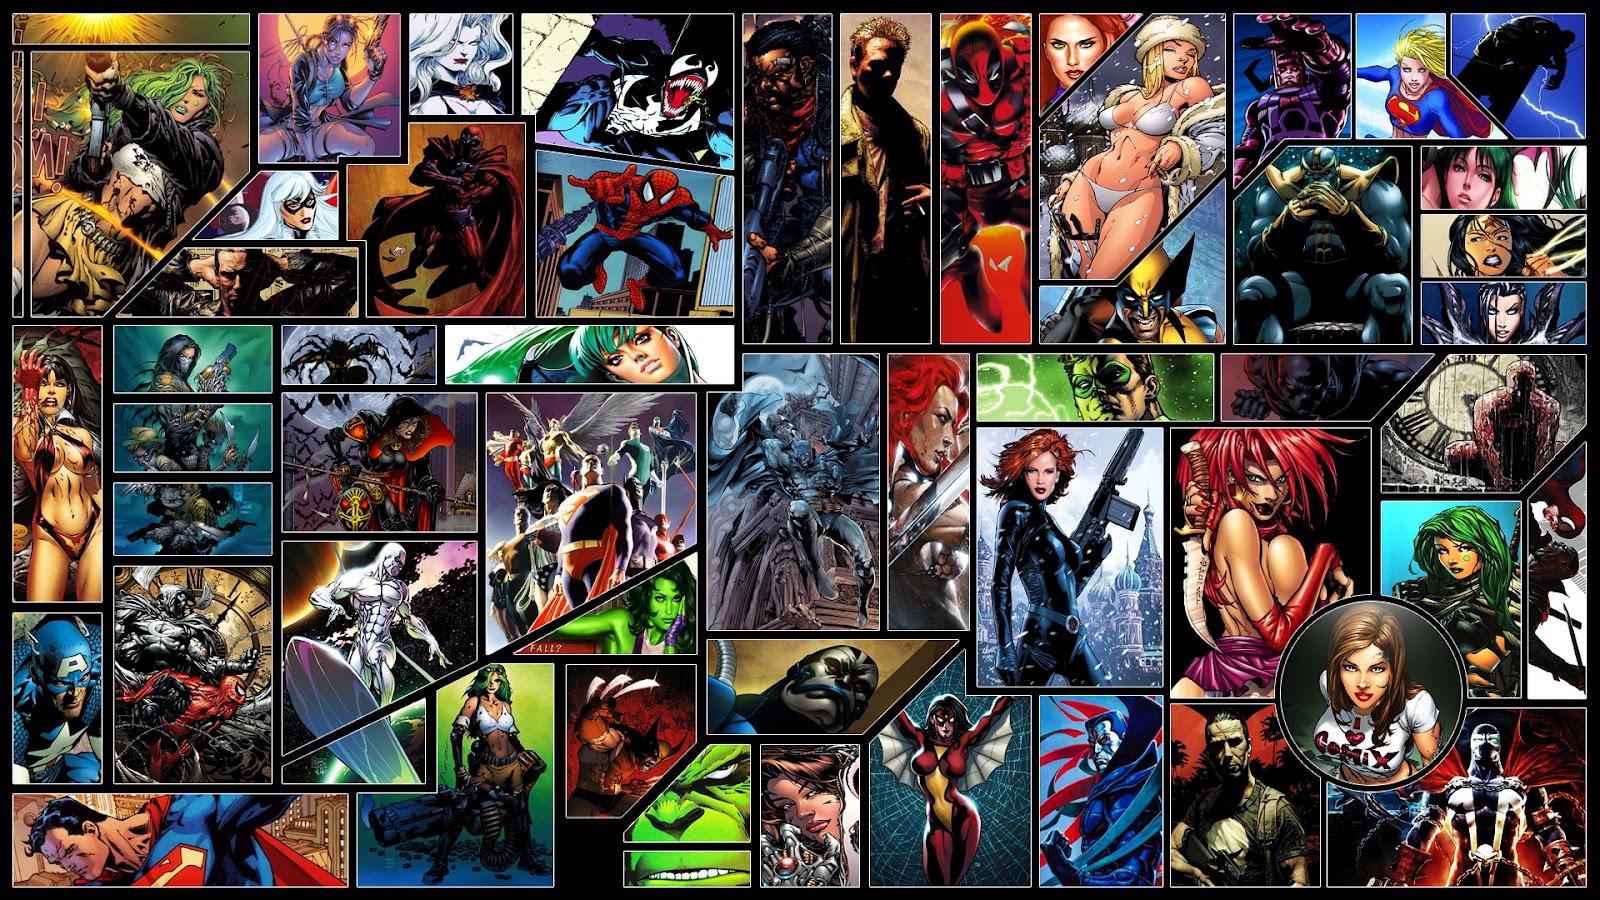 http://3.bp.blogspot.com/-XU5dA39rcyY/UEM2VdVU_WI/AAAAAAAAEms/R78zQNOPLHI/s1600/dc-comics-marvel-1080.jpg